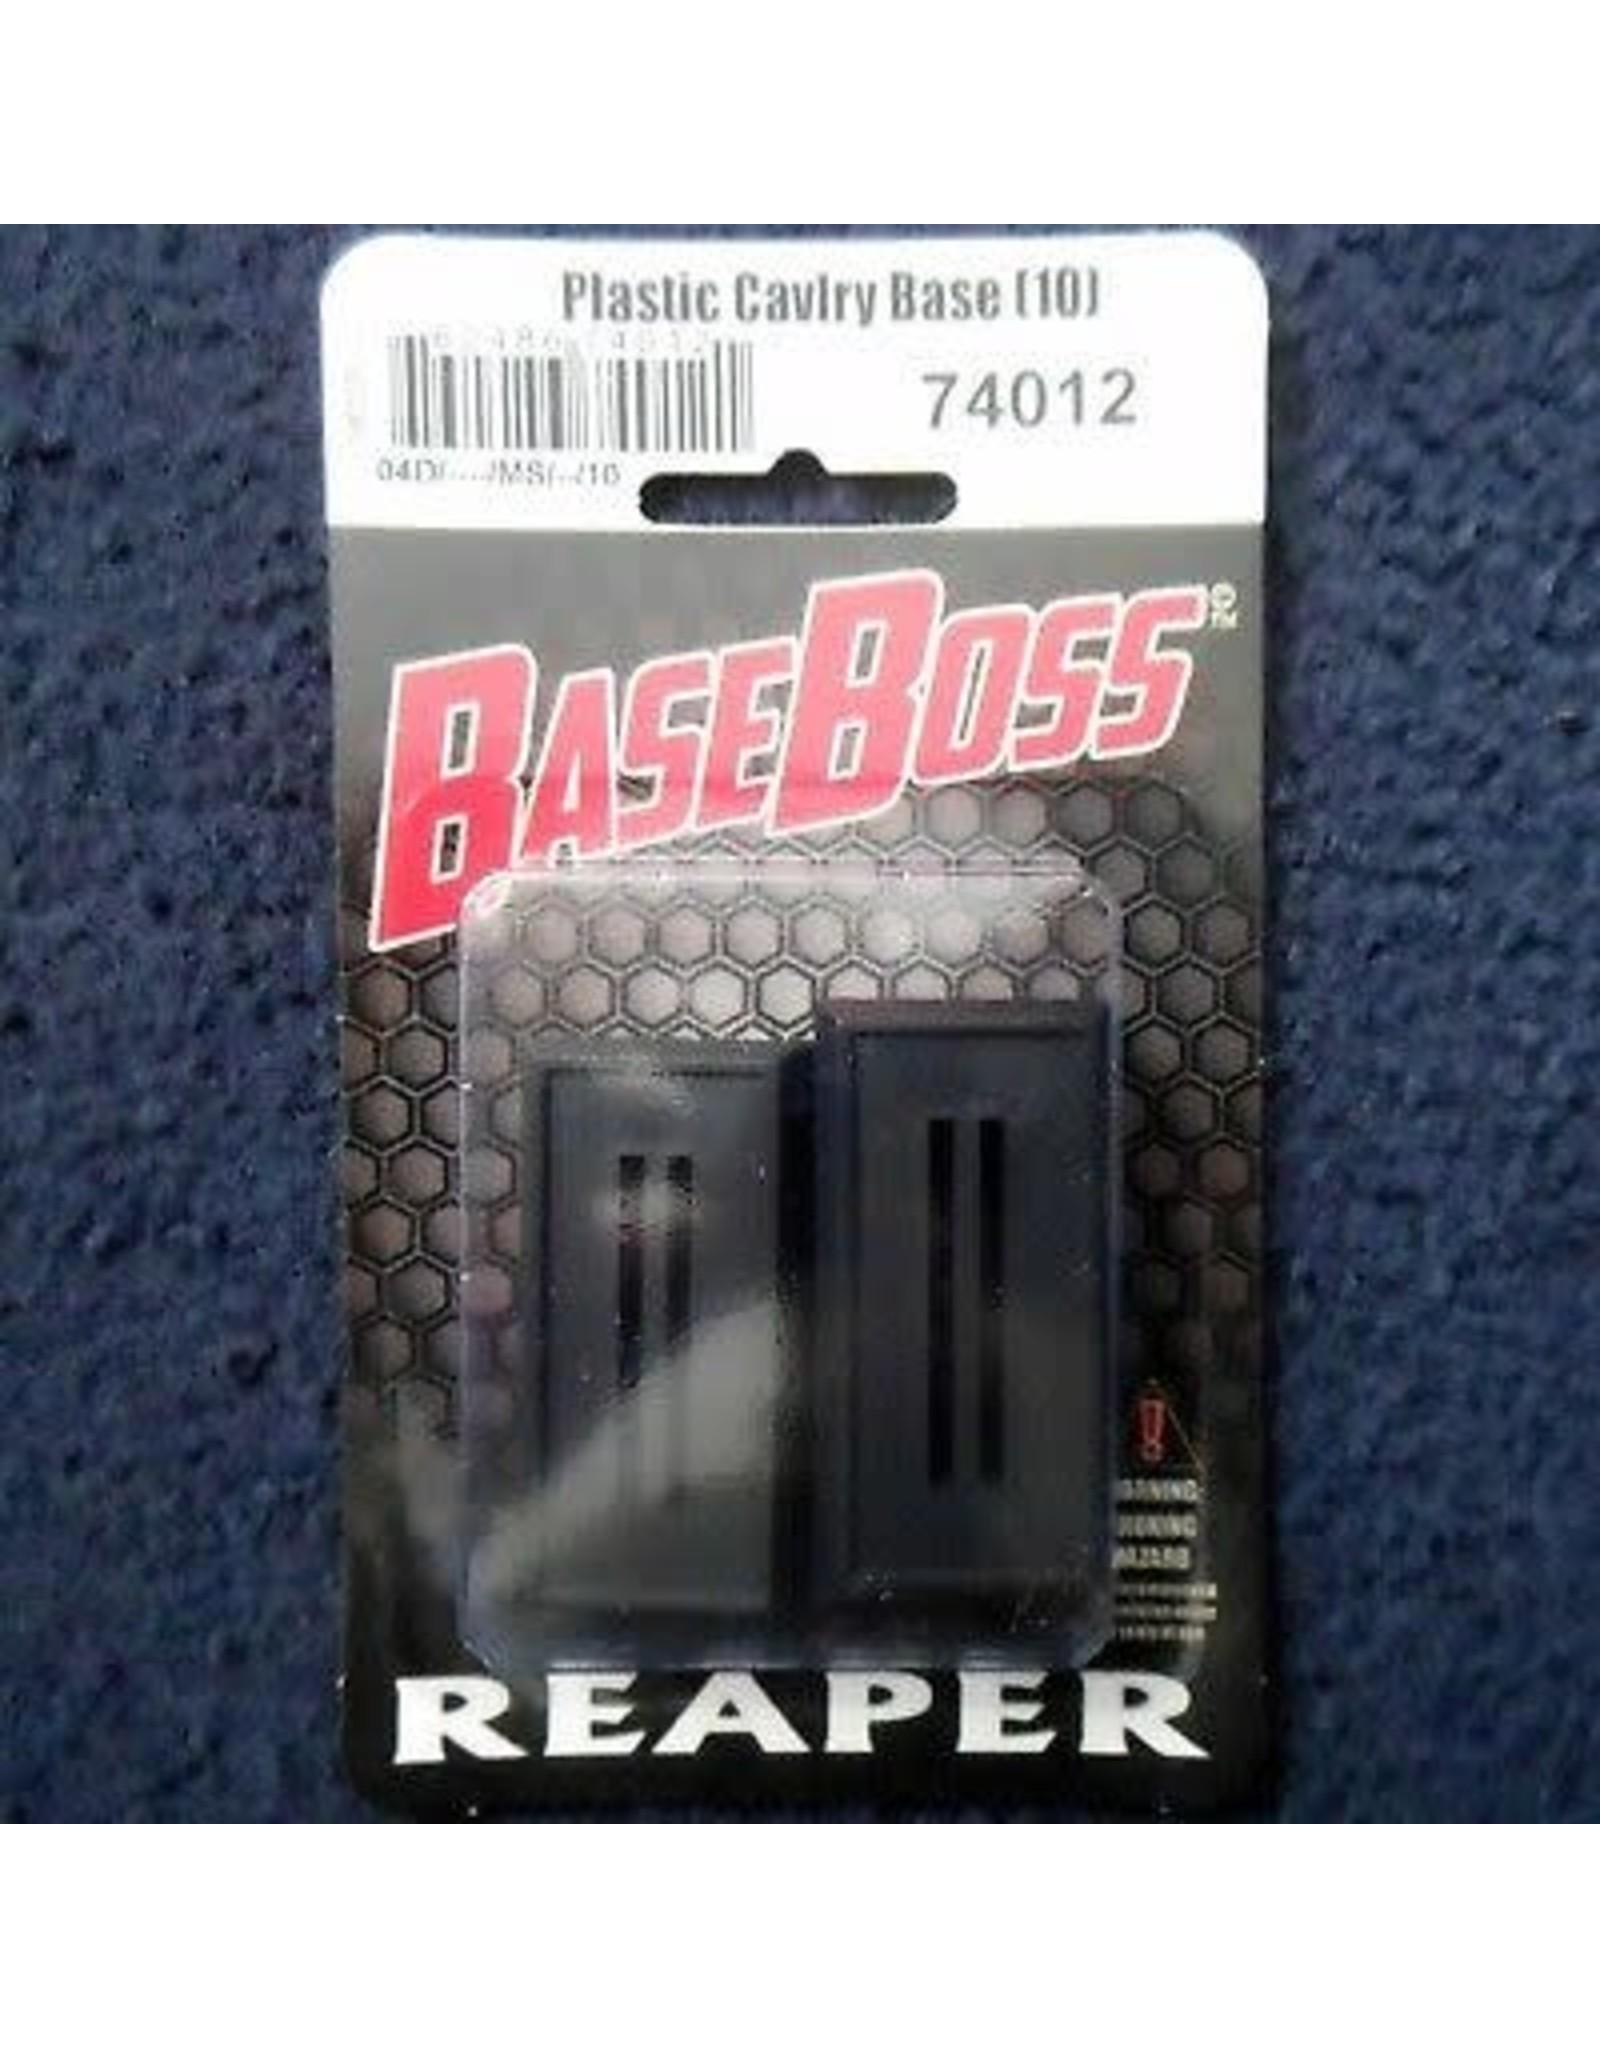 Reaper Mini Reaper Mini - Plastic Cavlry Base (10)